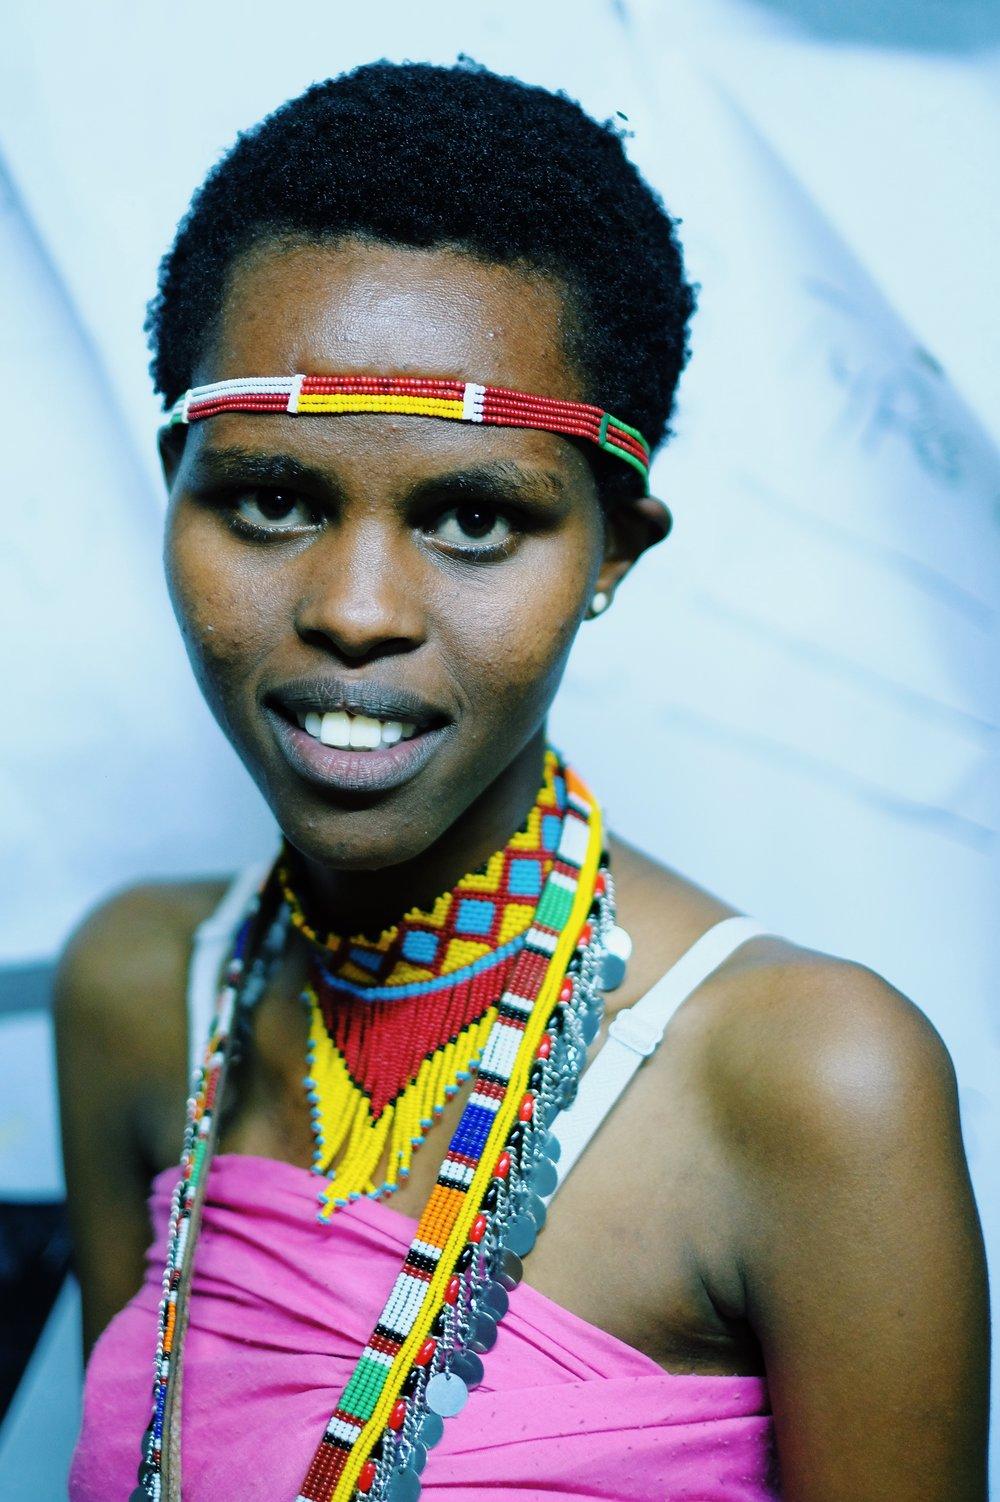 Maasai Olentoko 'End FGM' Beauty Pageant 6 by Joost Bastmeijer.jpeg